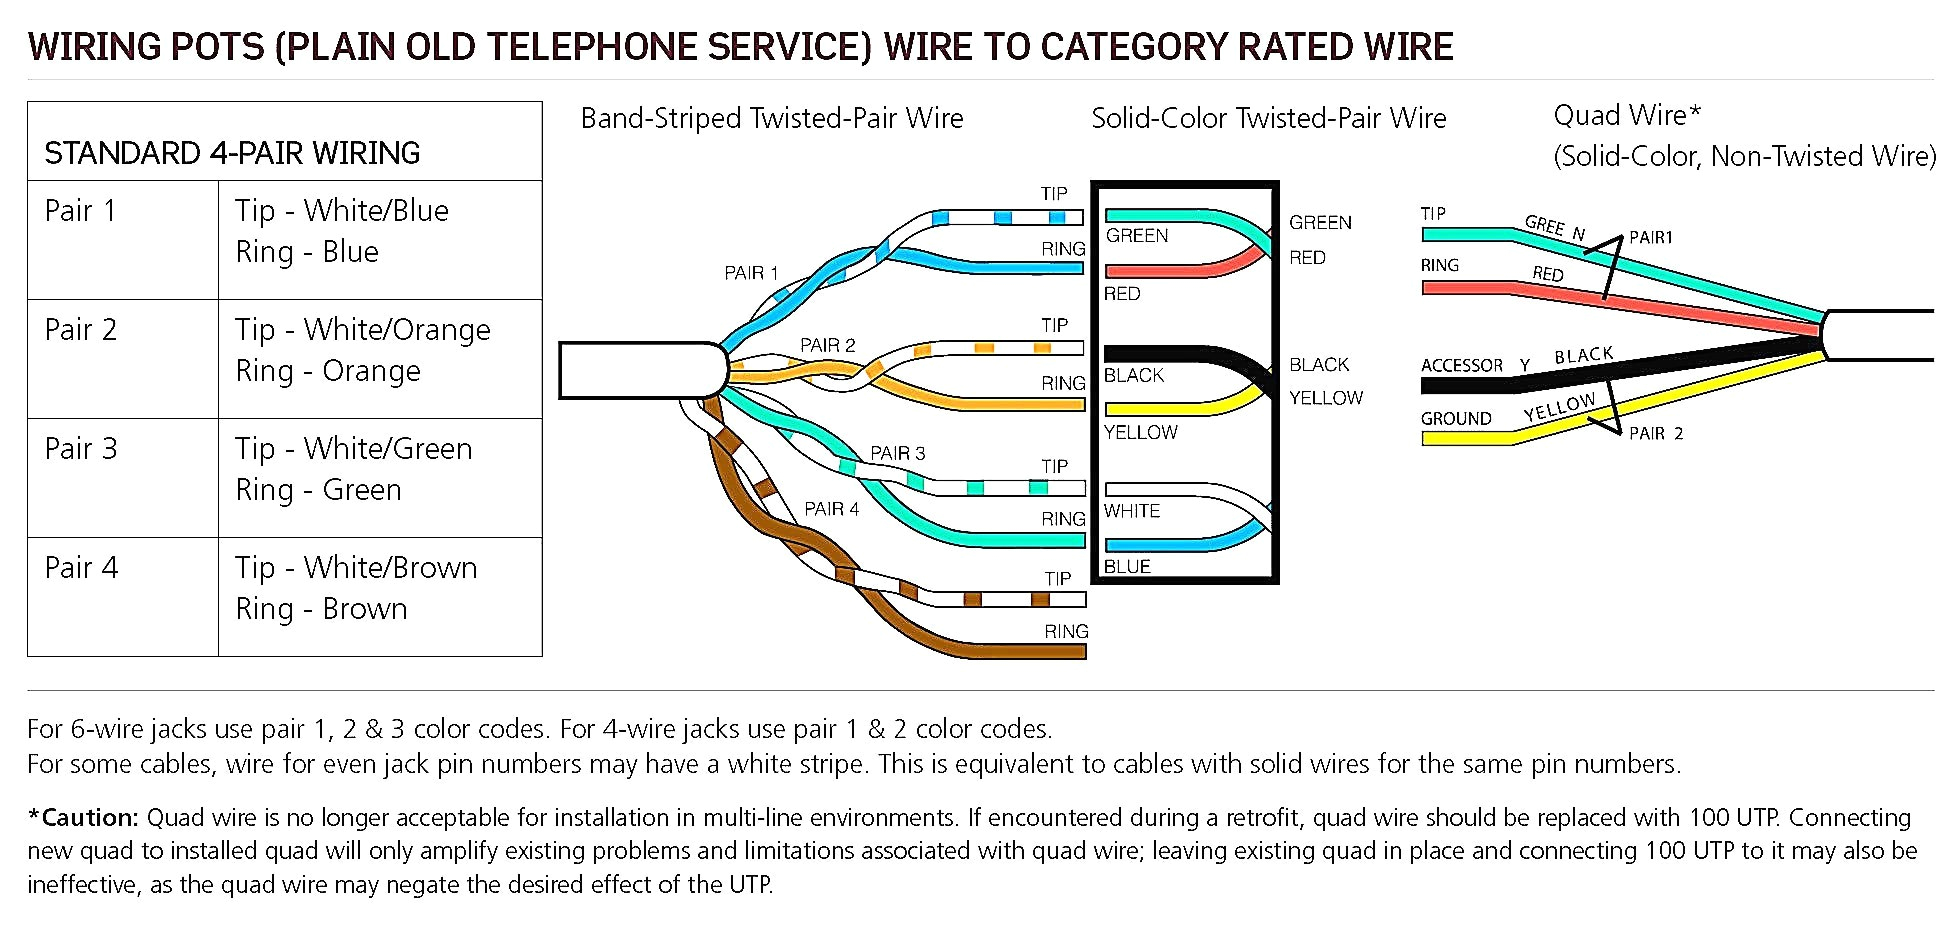 Modular Phone Jack Wiring Diagram 4 Wire Telephone Line Diagram Wiring Diagram Post